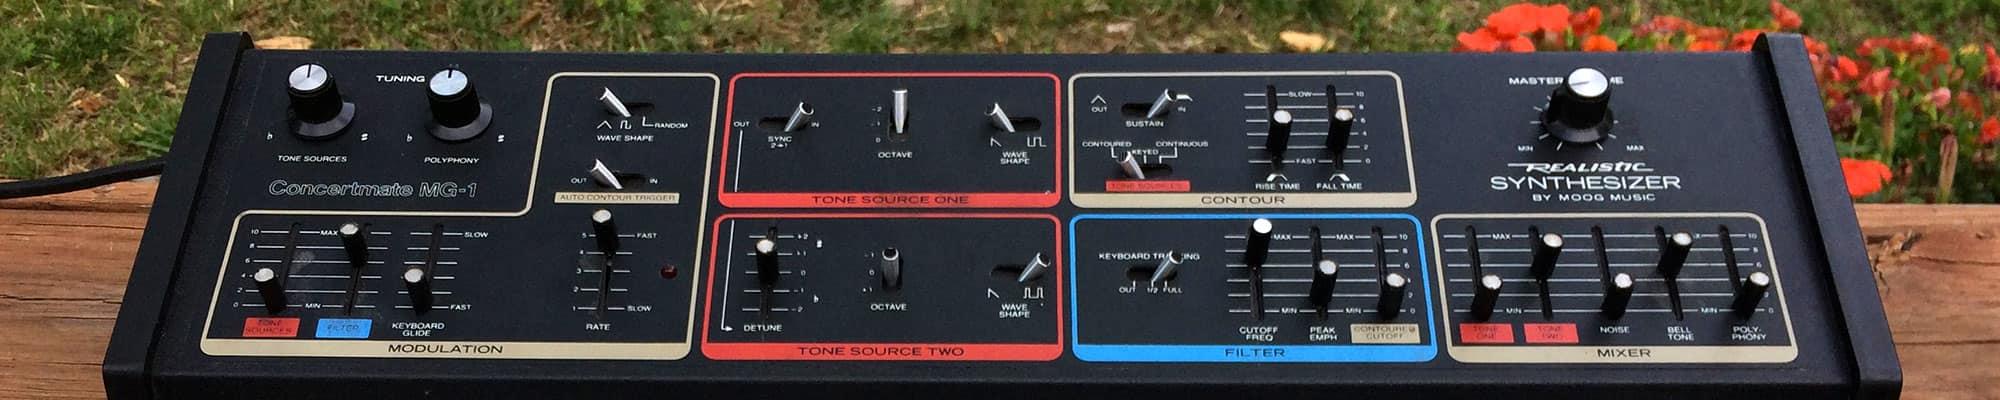 Radioshacks Neglected Moog Exploring The Realistic Reverb News Taurus Schematics 2